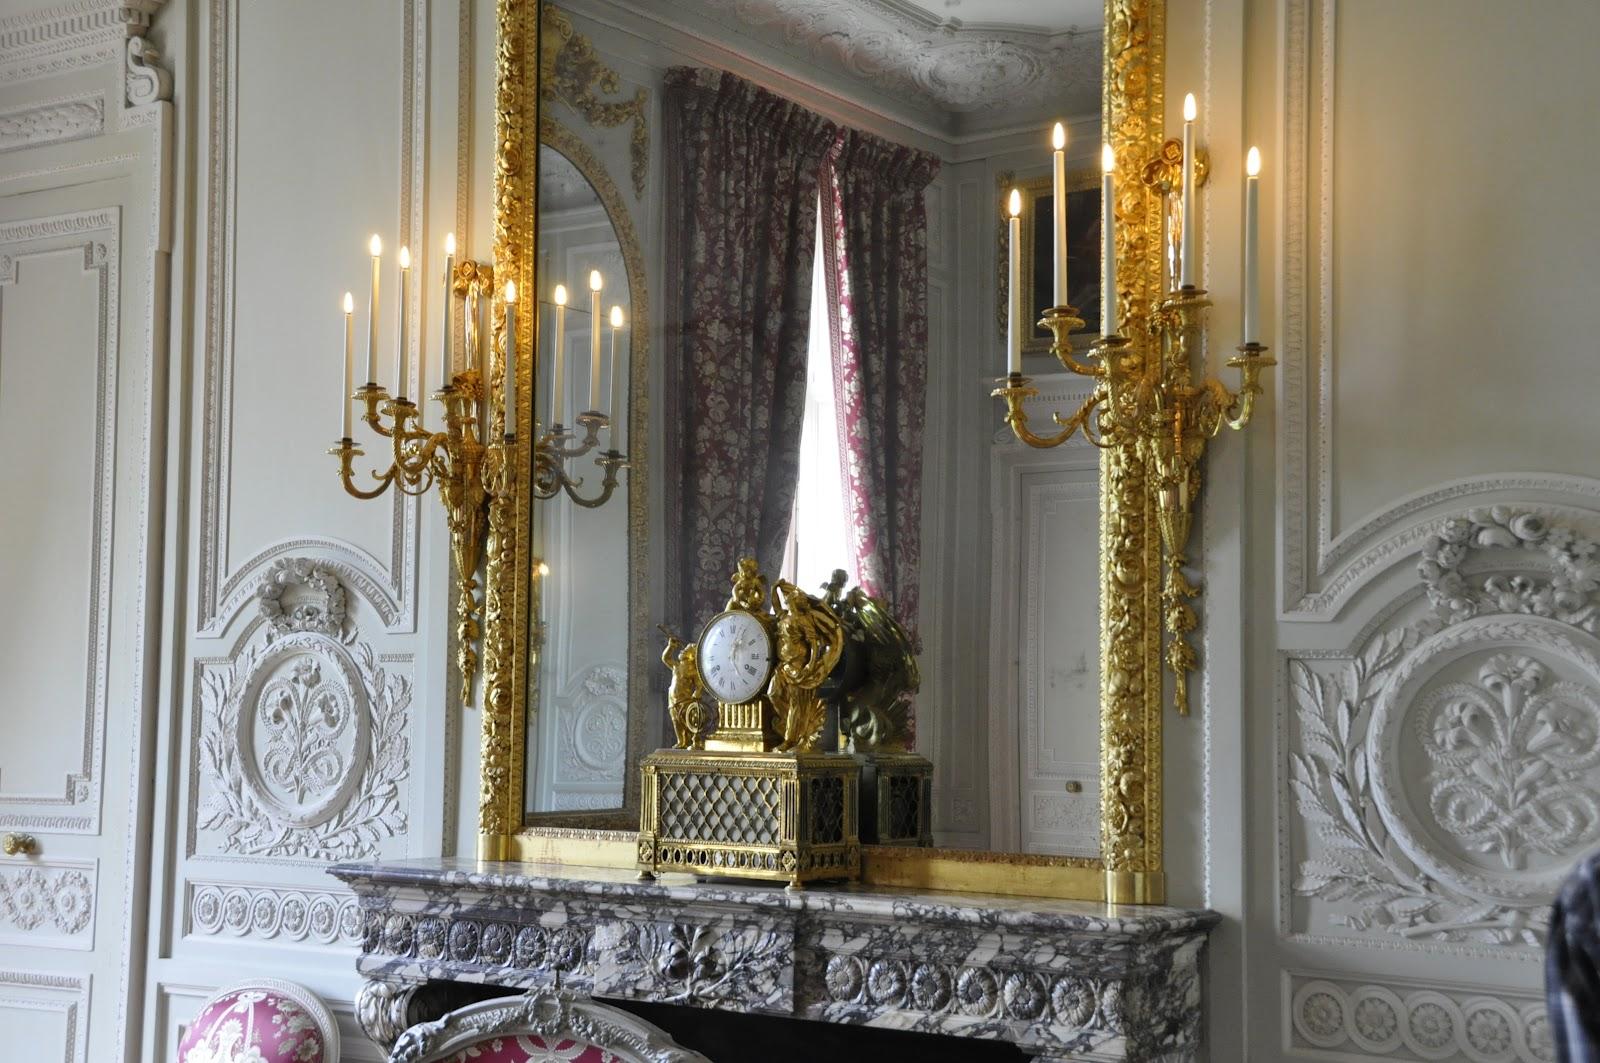 Ornamentsnijder patrick damiaens het kleine trianon in versailles le petit trianon de marie - Stijl van marie antoinette ...